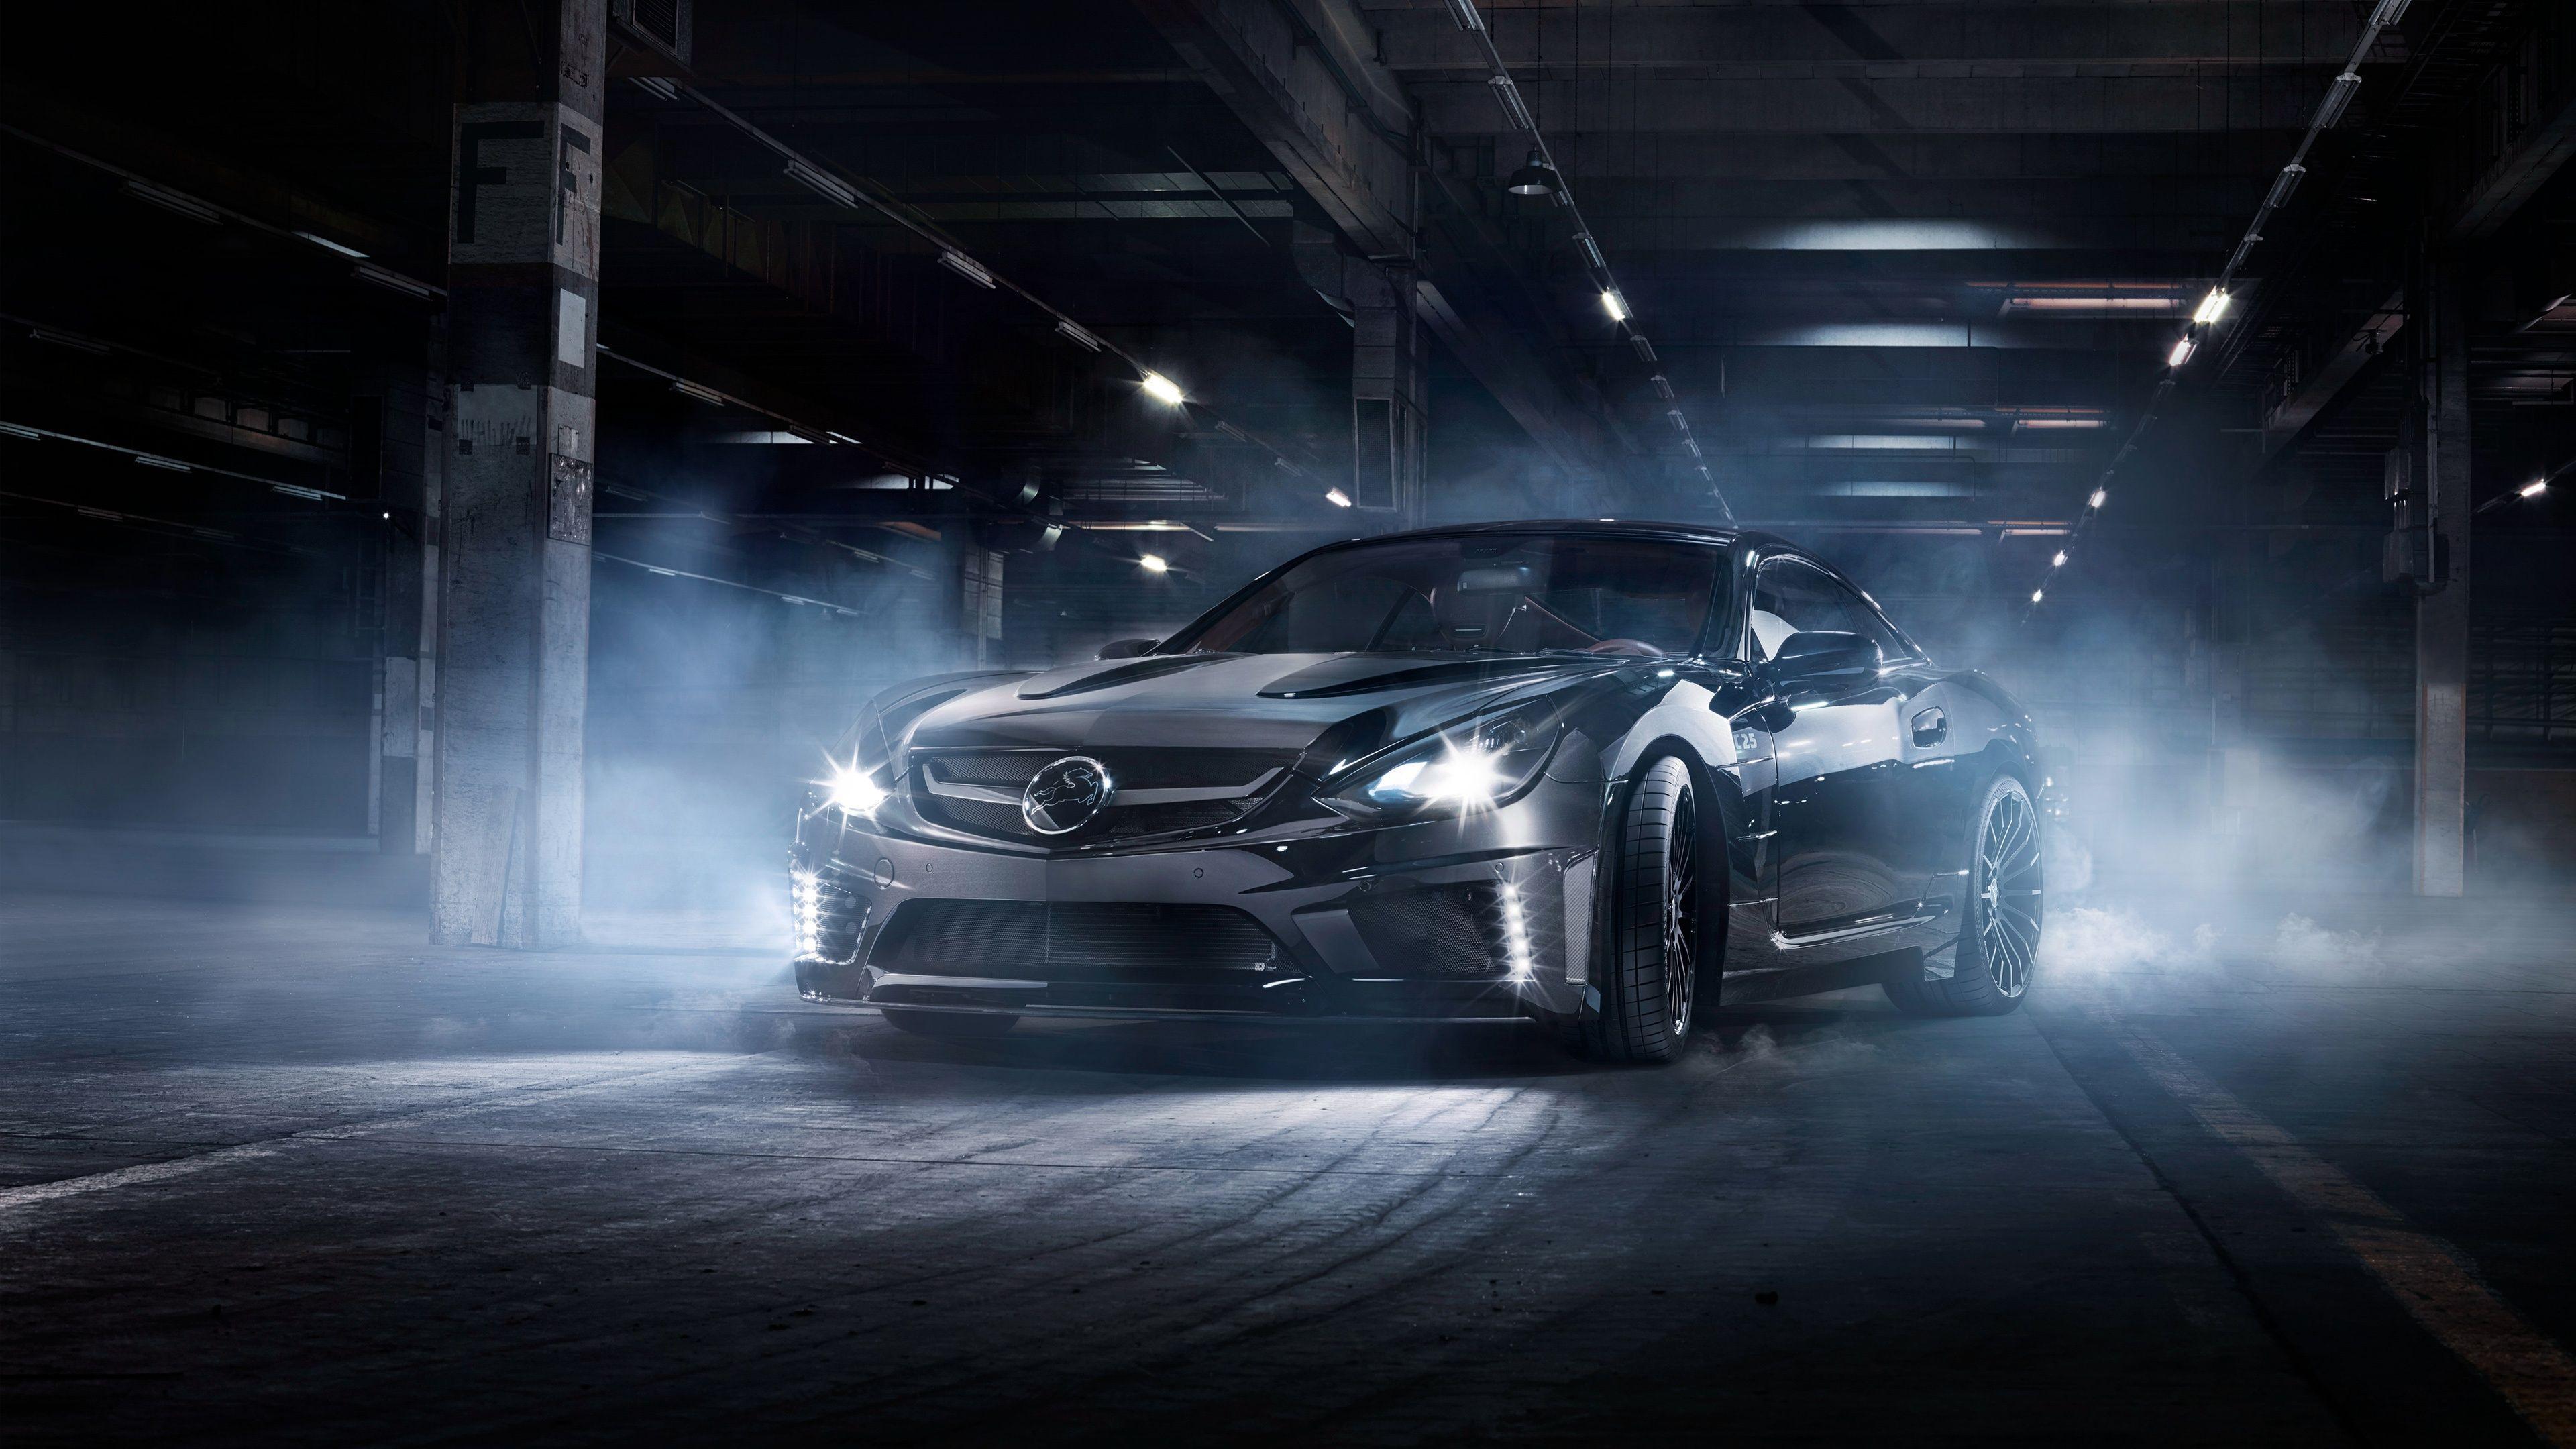 Mercedes Benz Wallpapers 3840x2160